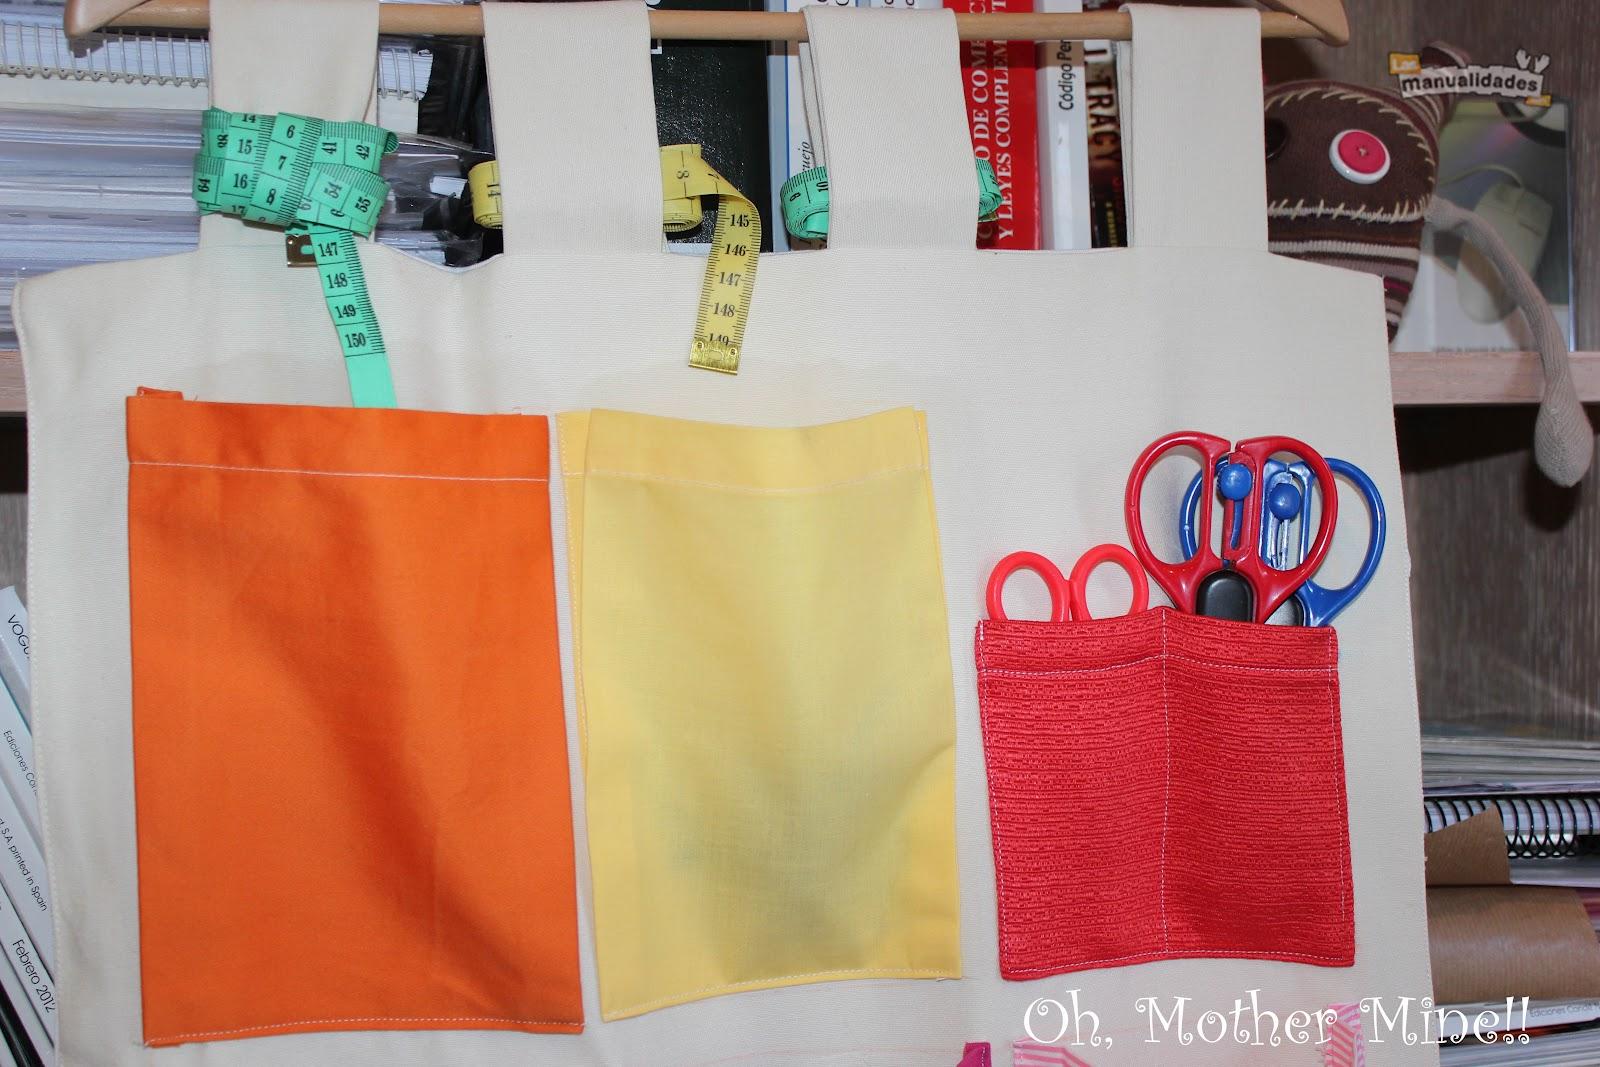 Tapiz organizador port til con bolsillos para guardar - Organizador de juguetes ...